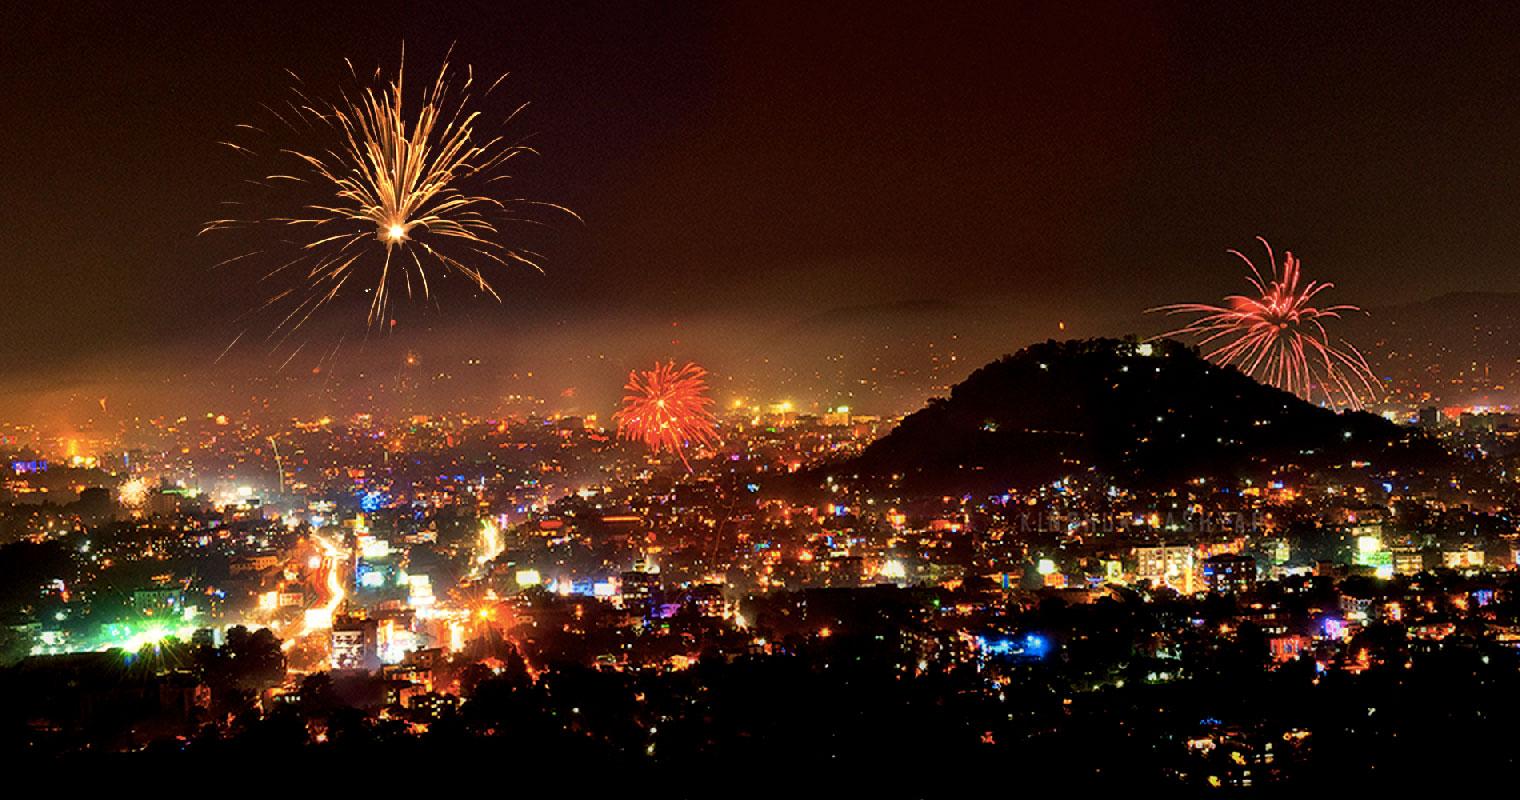 Global leaders greet India on Diwali, Gujarat for upcoming Gujarati new year day